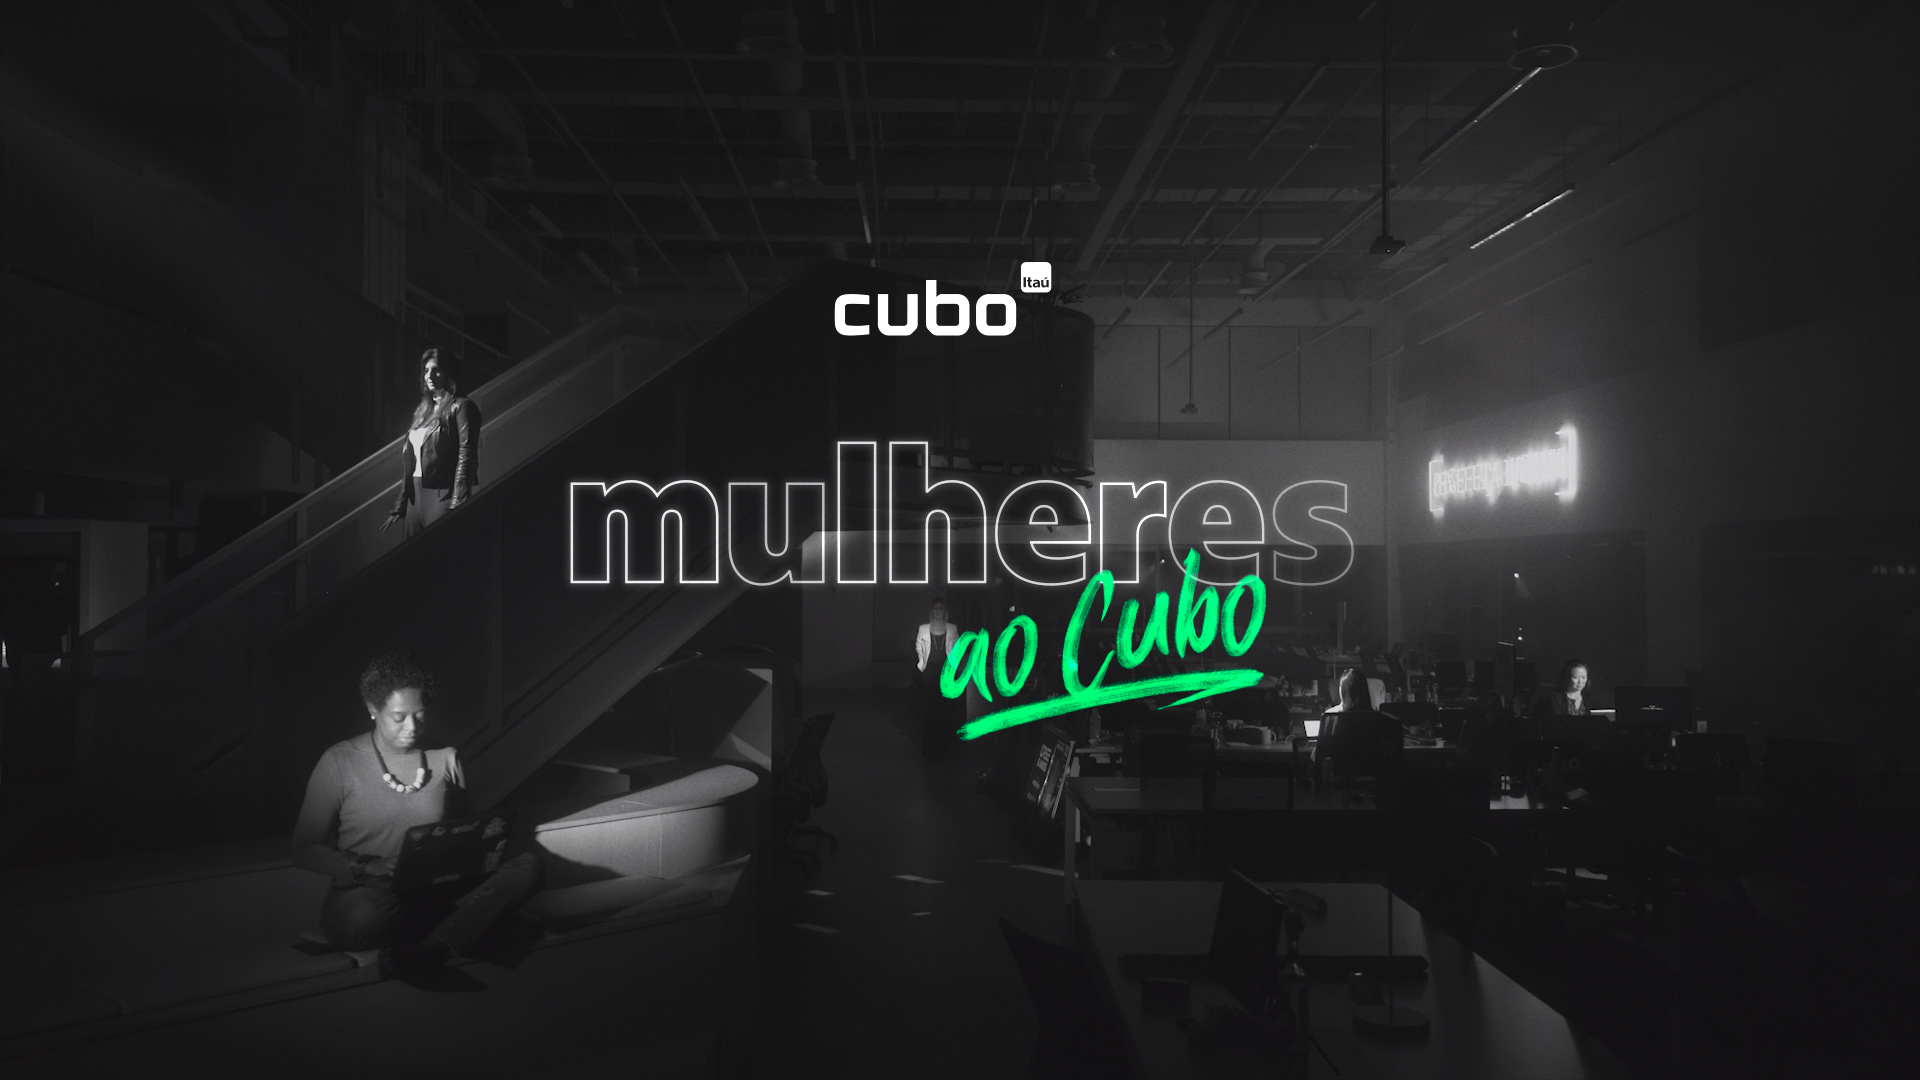 CUBO ITAÚ women cubed